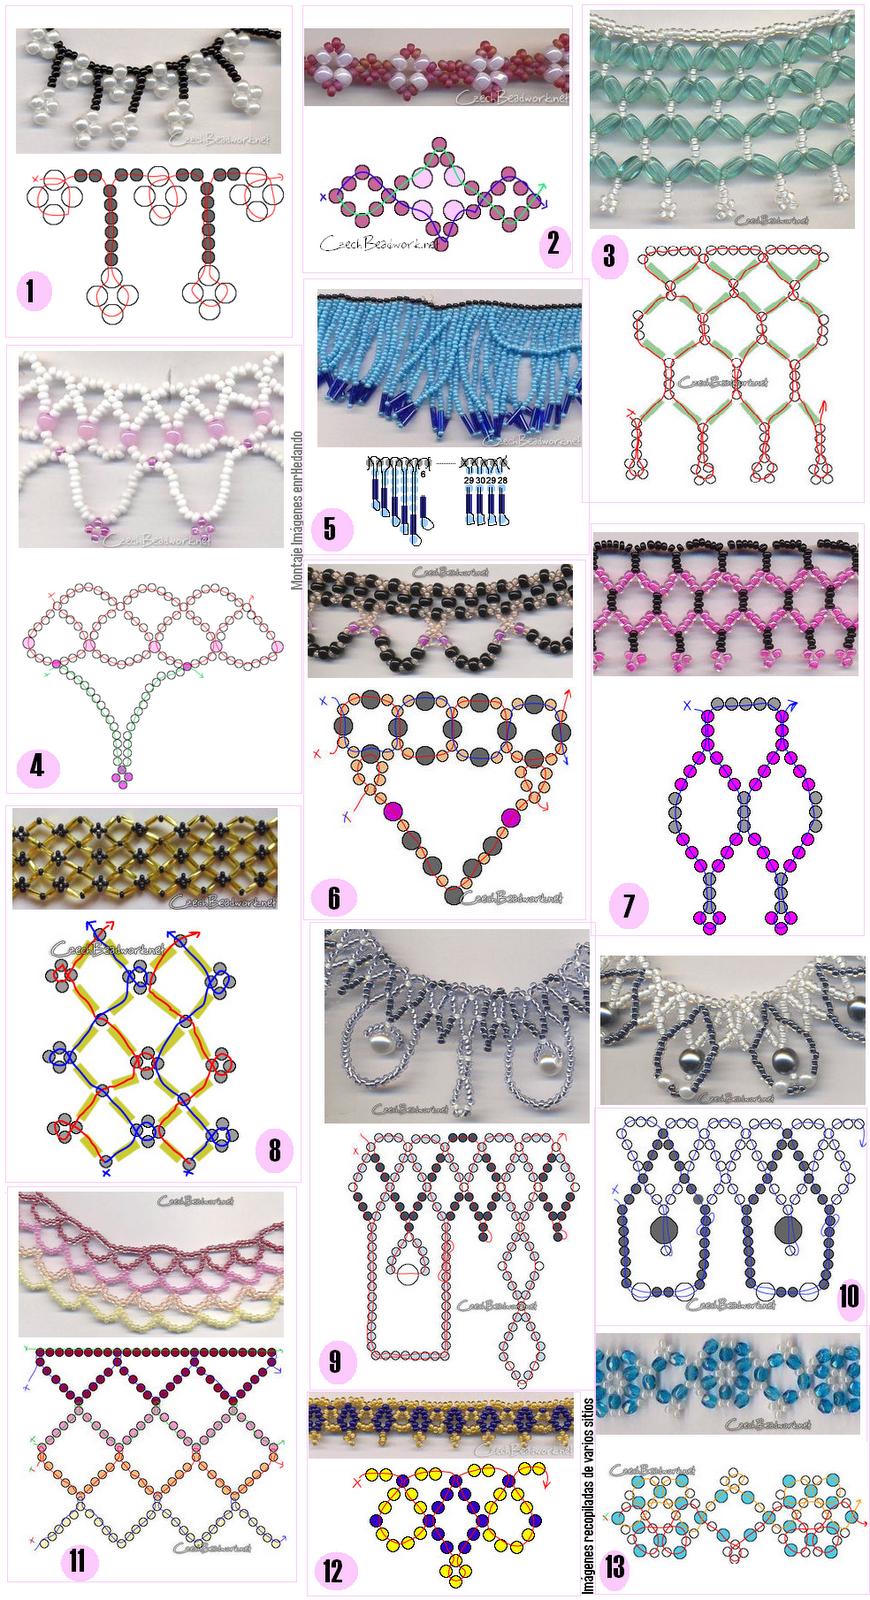 diy how to do netting stitch tutorials